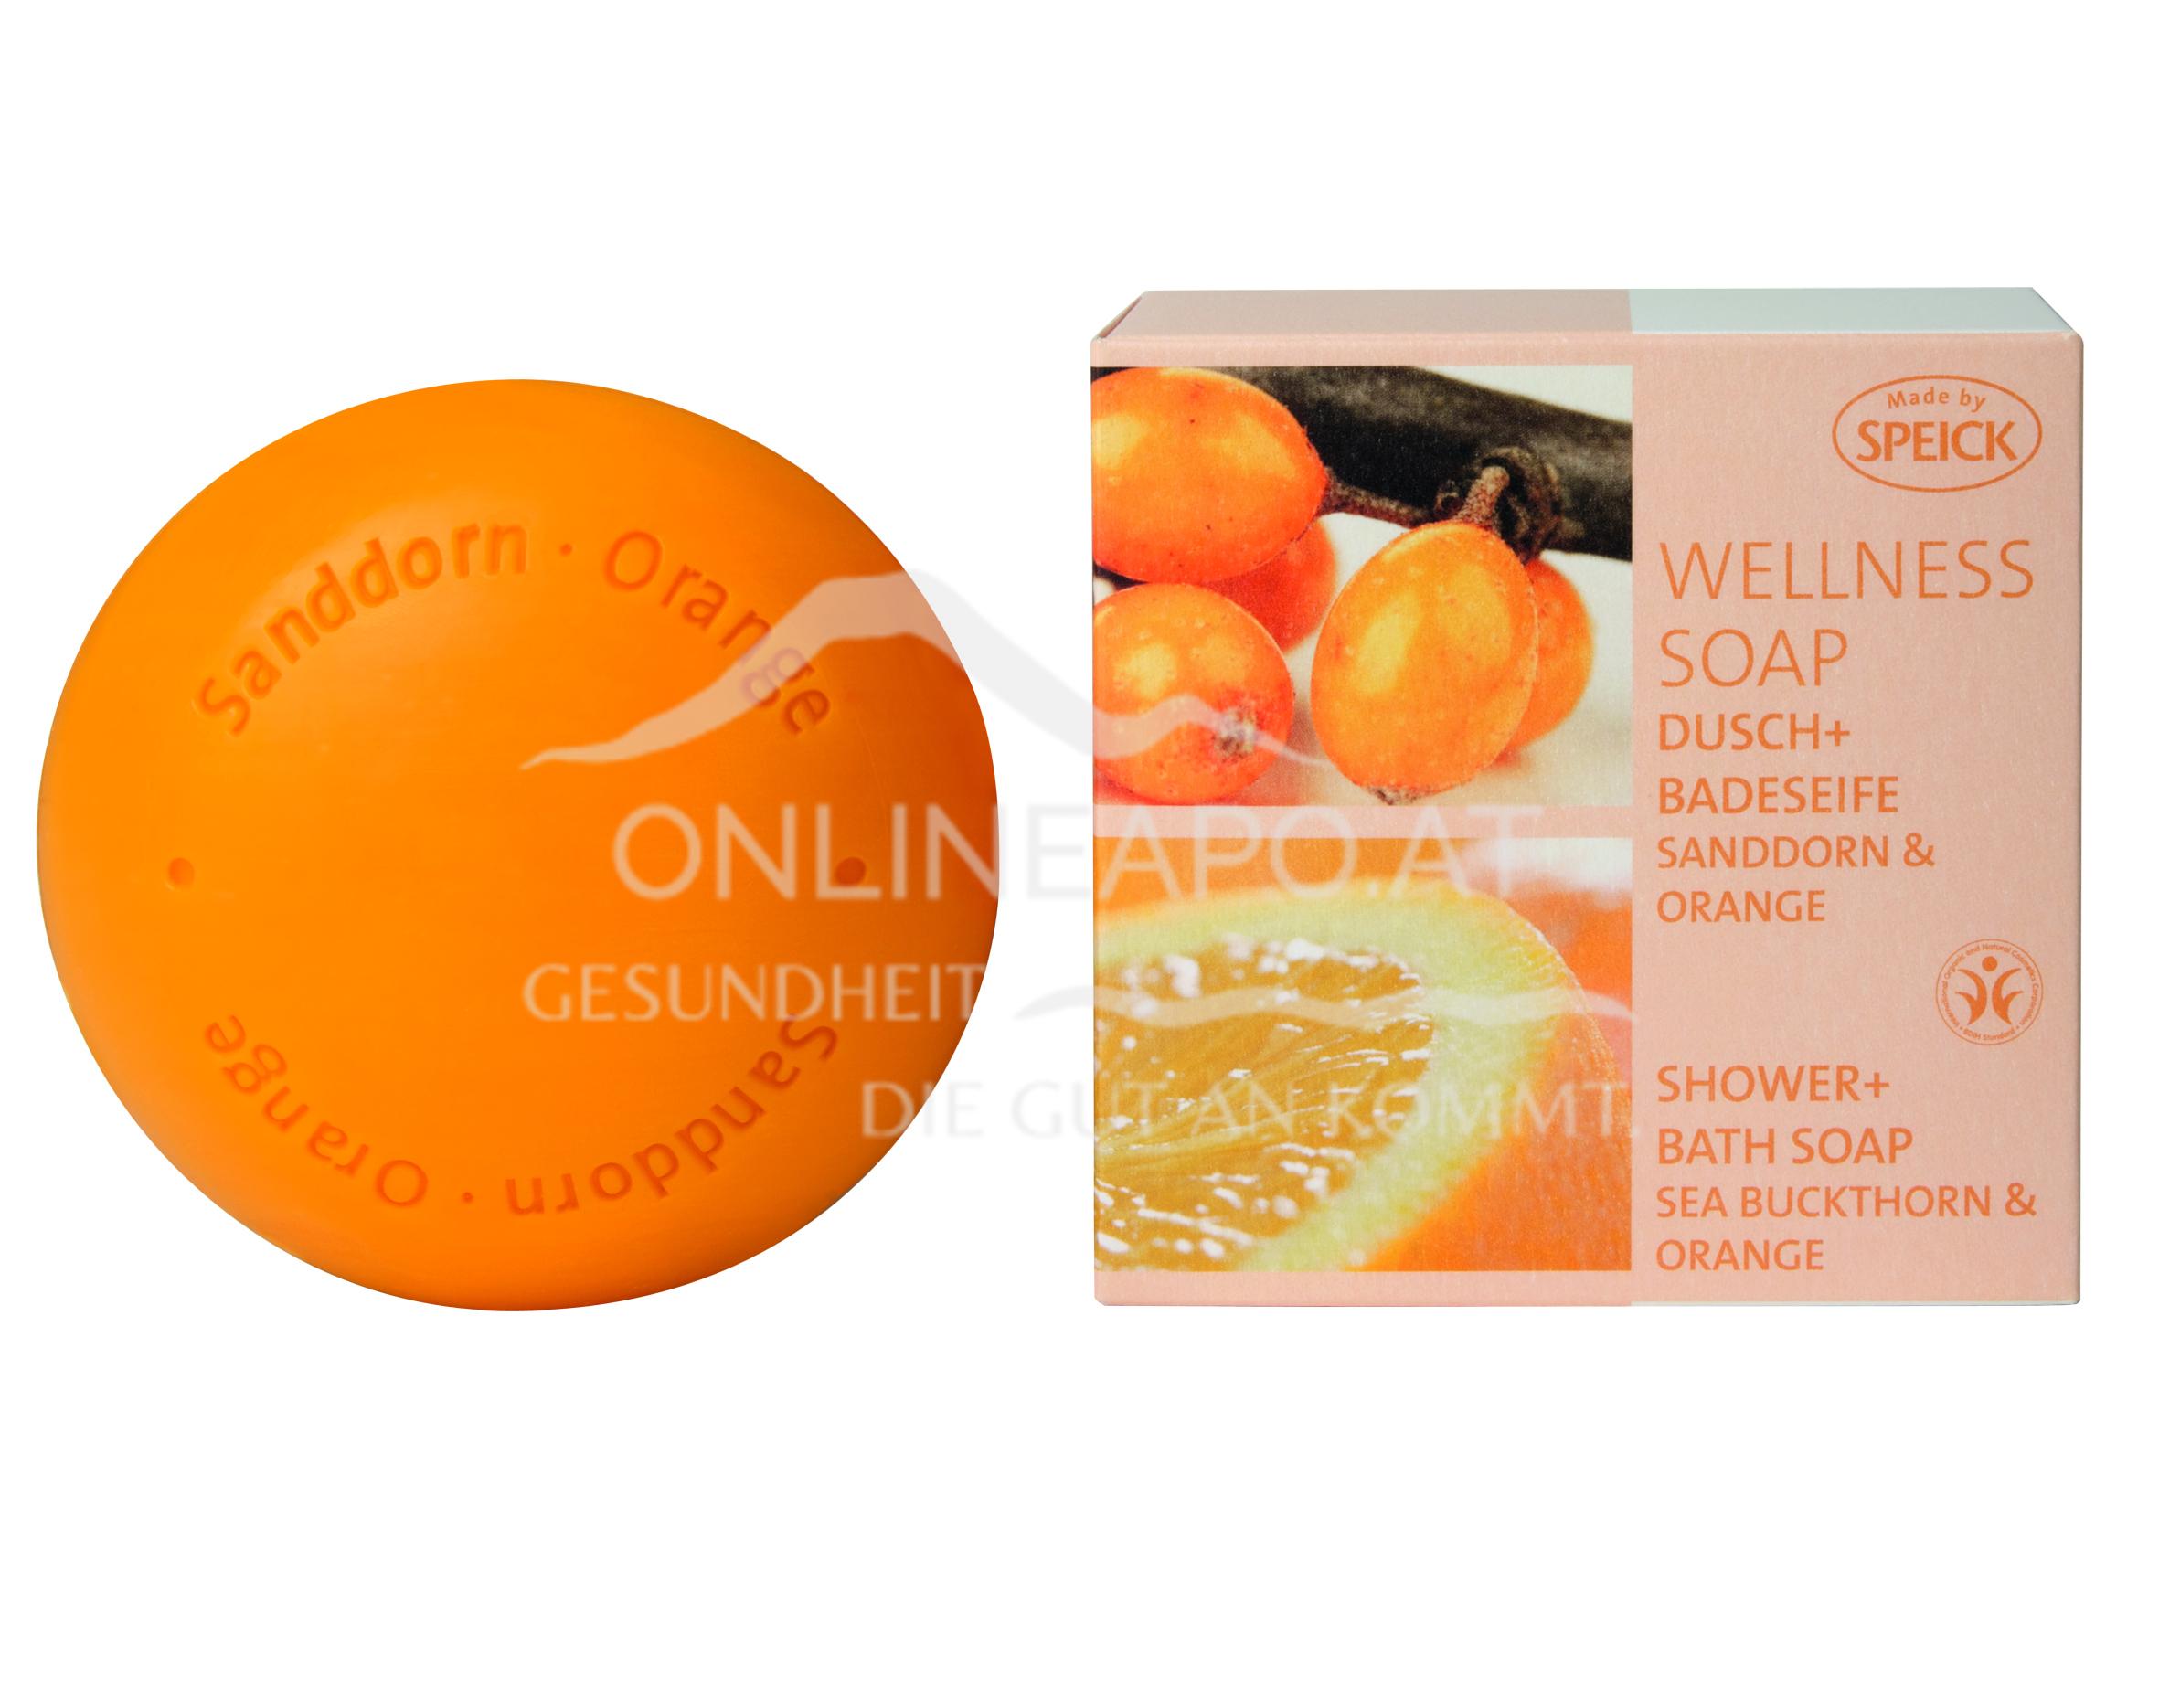 Made by Speick Wellness Soap Sanddorn & Orange